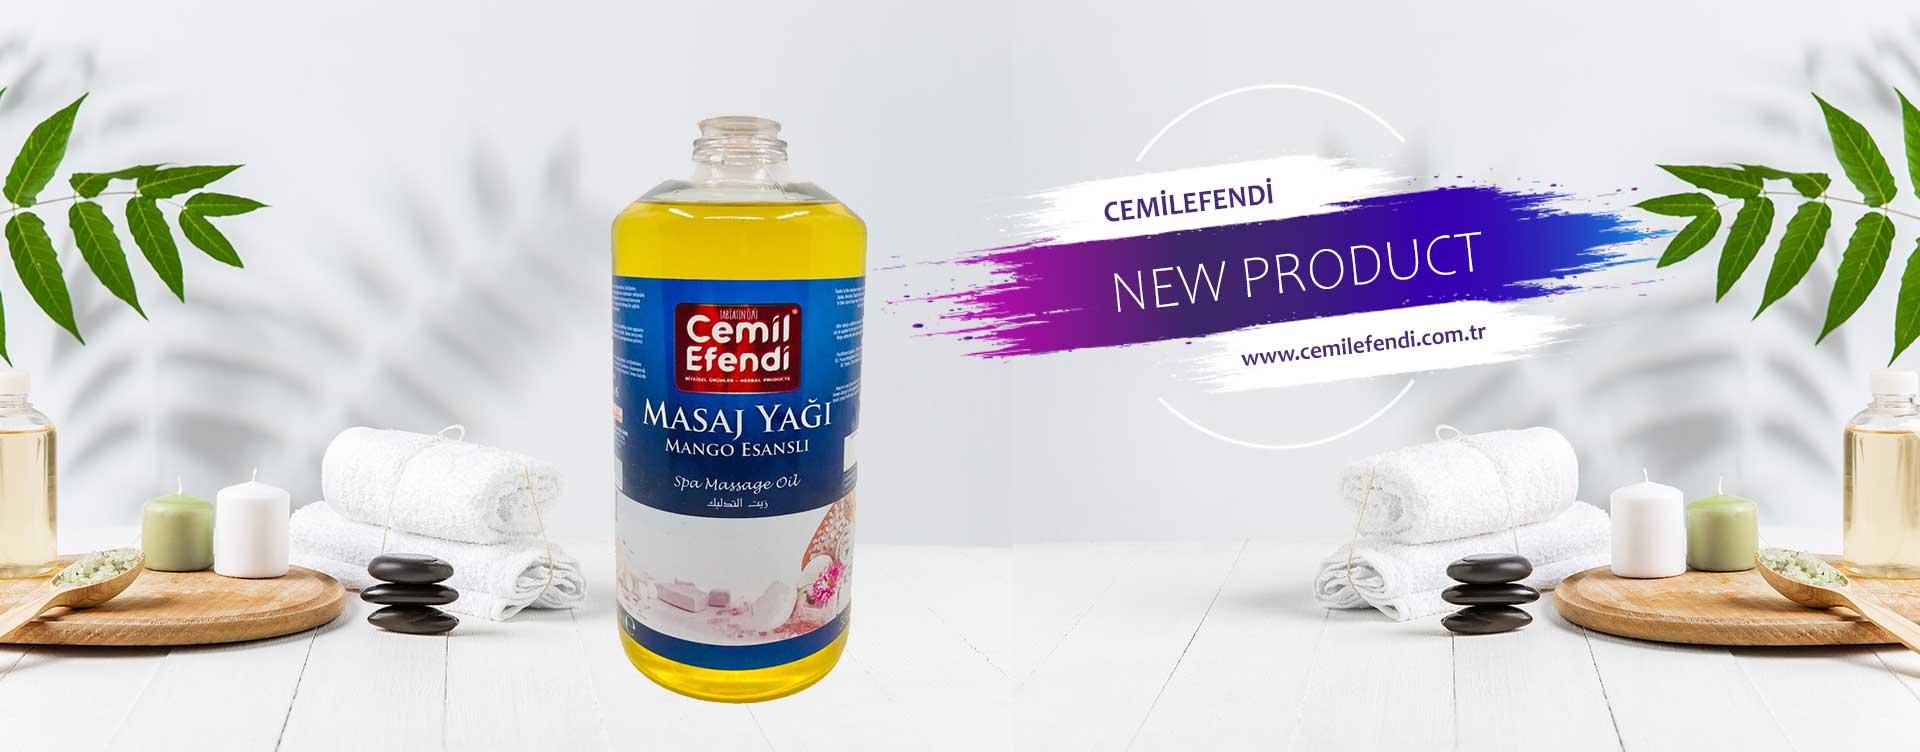 Spa Massage Oil 1000 ml